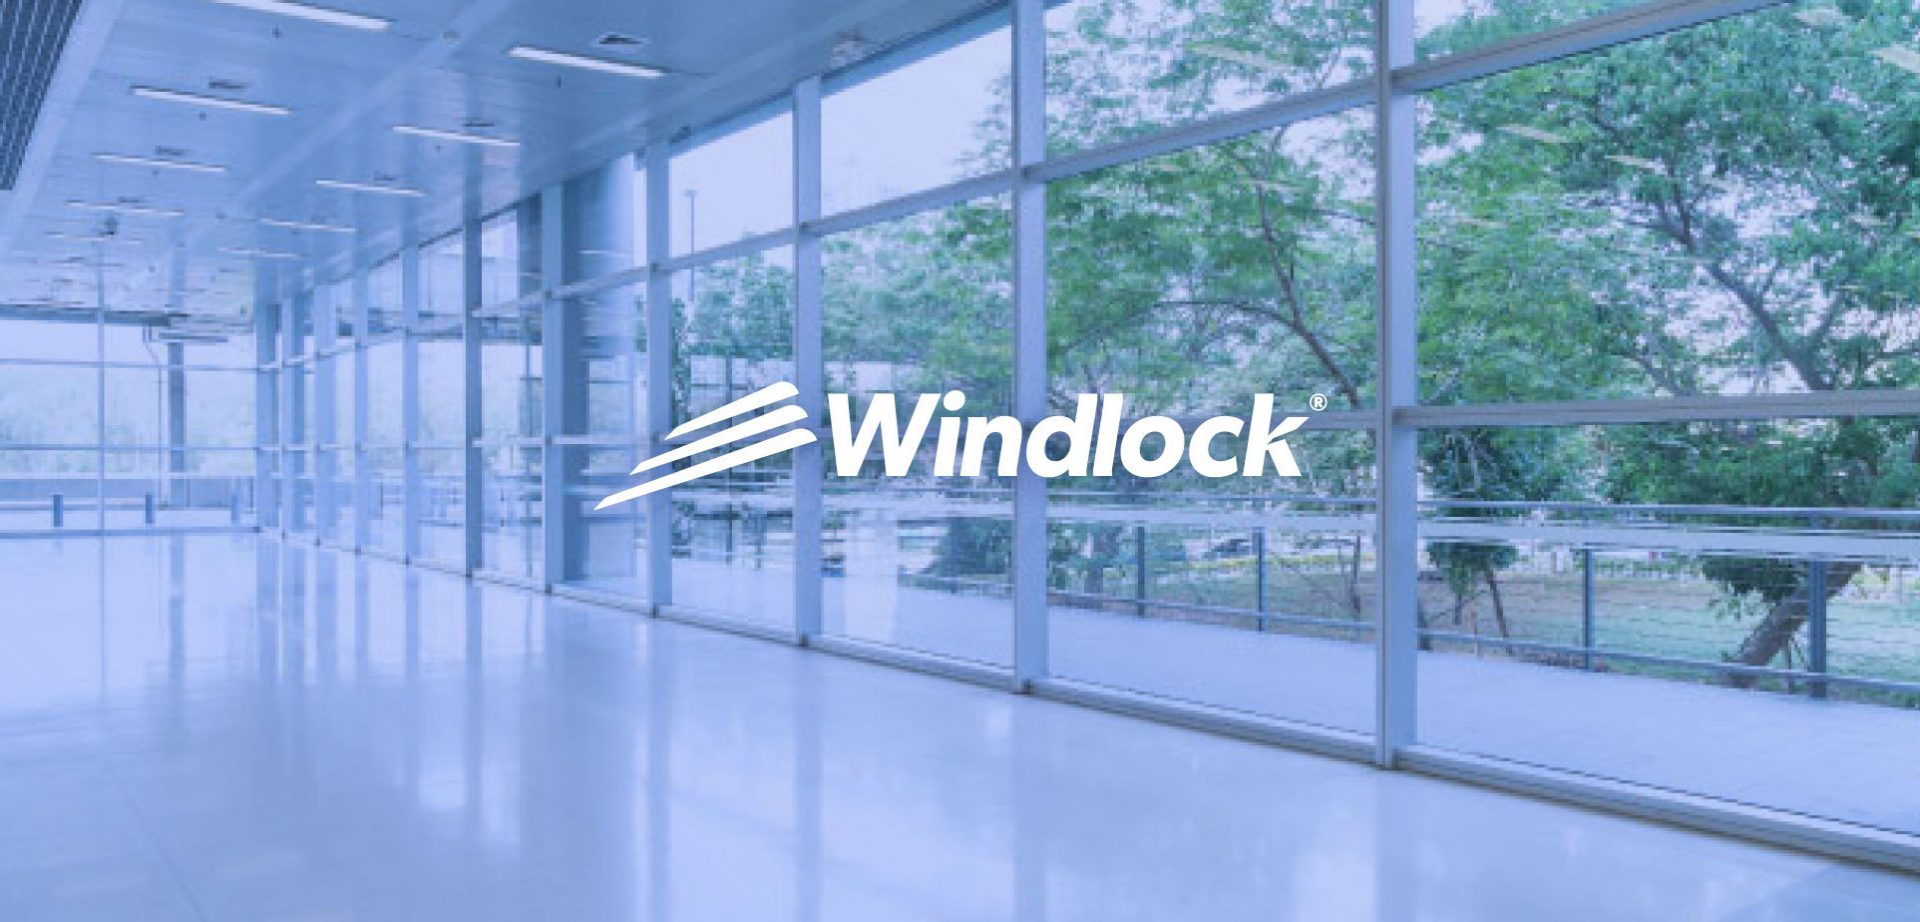 Windlock